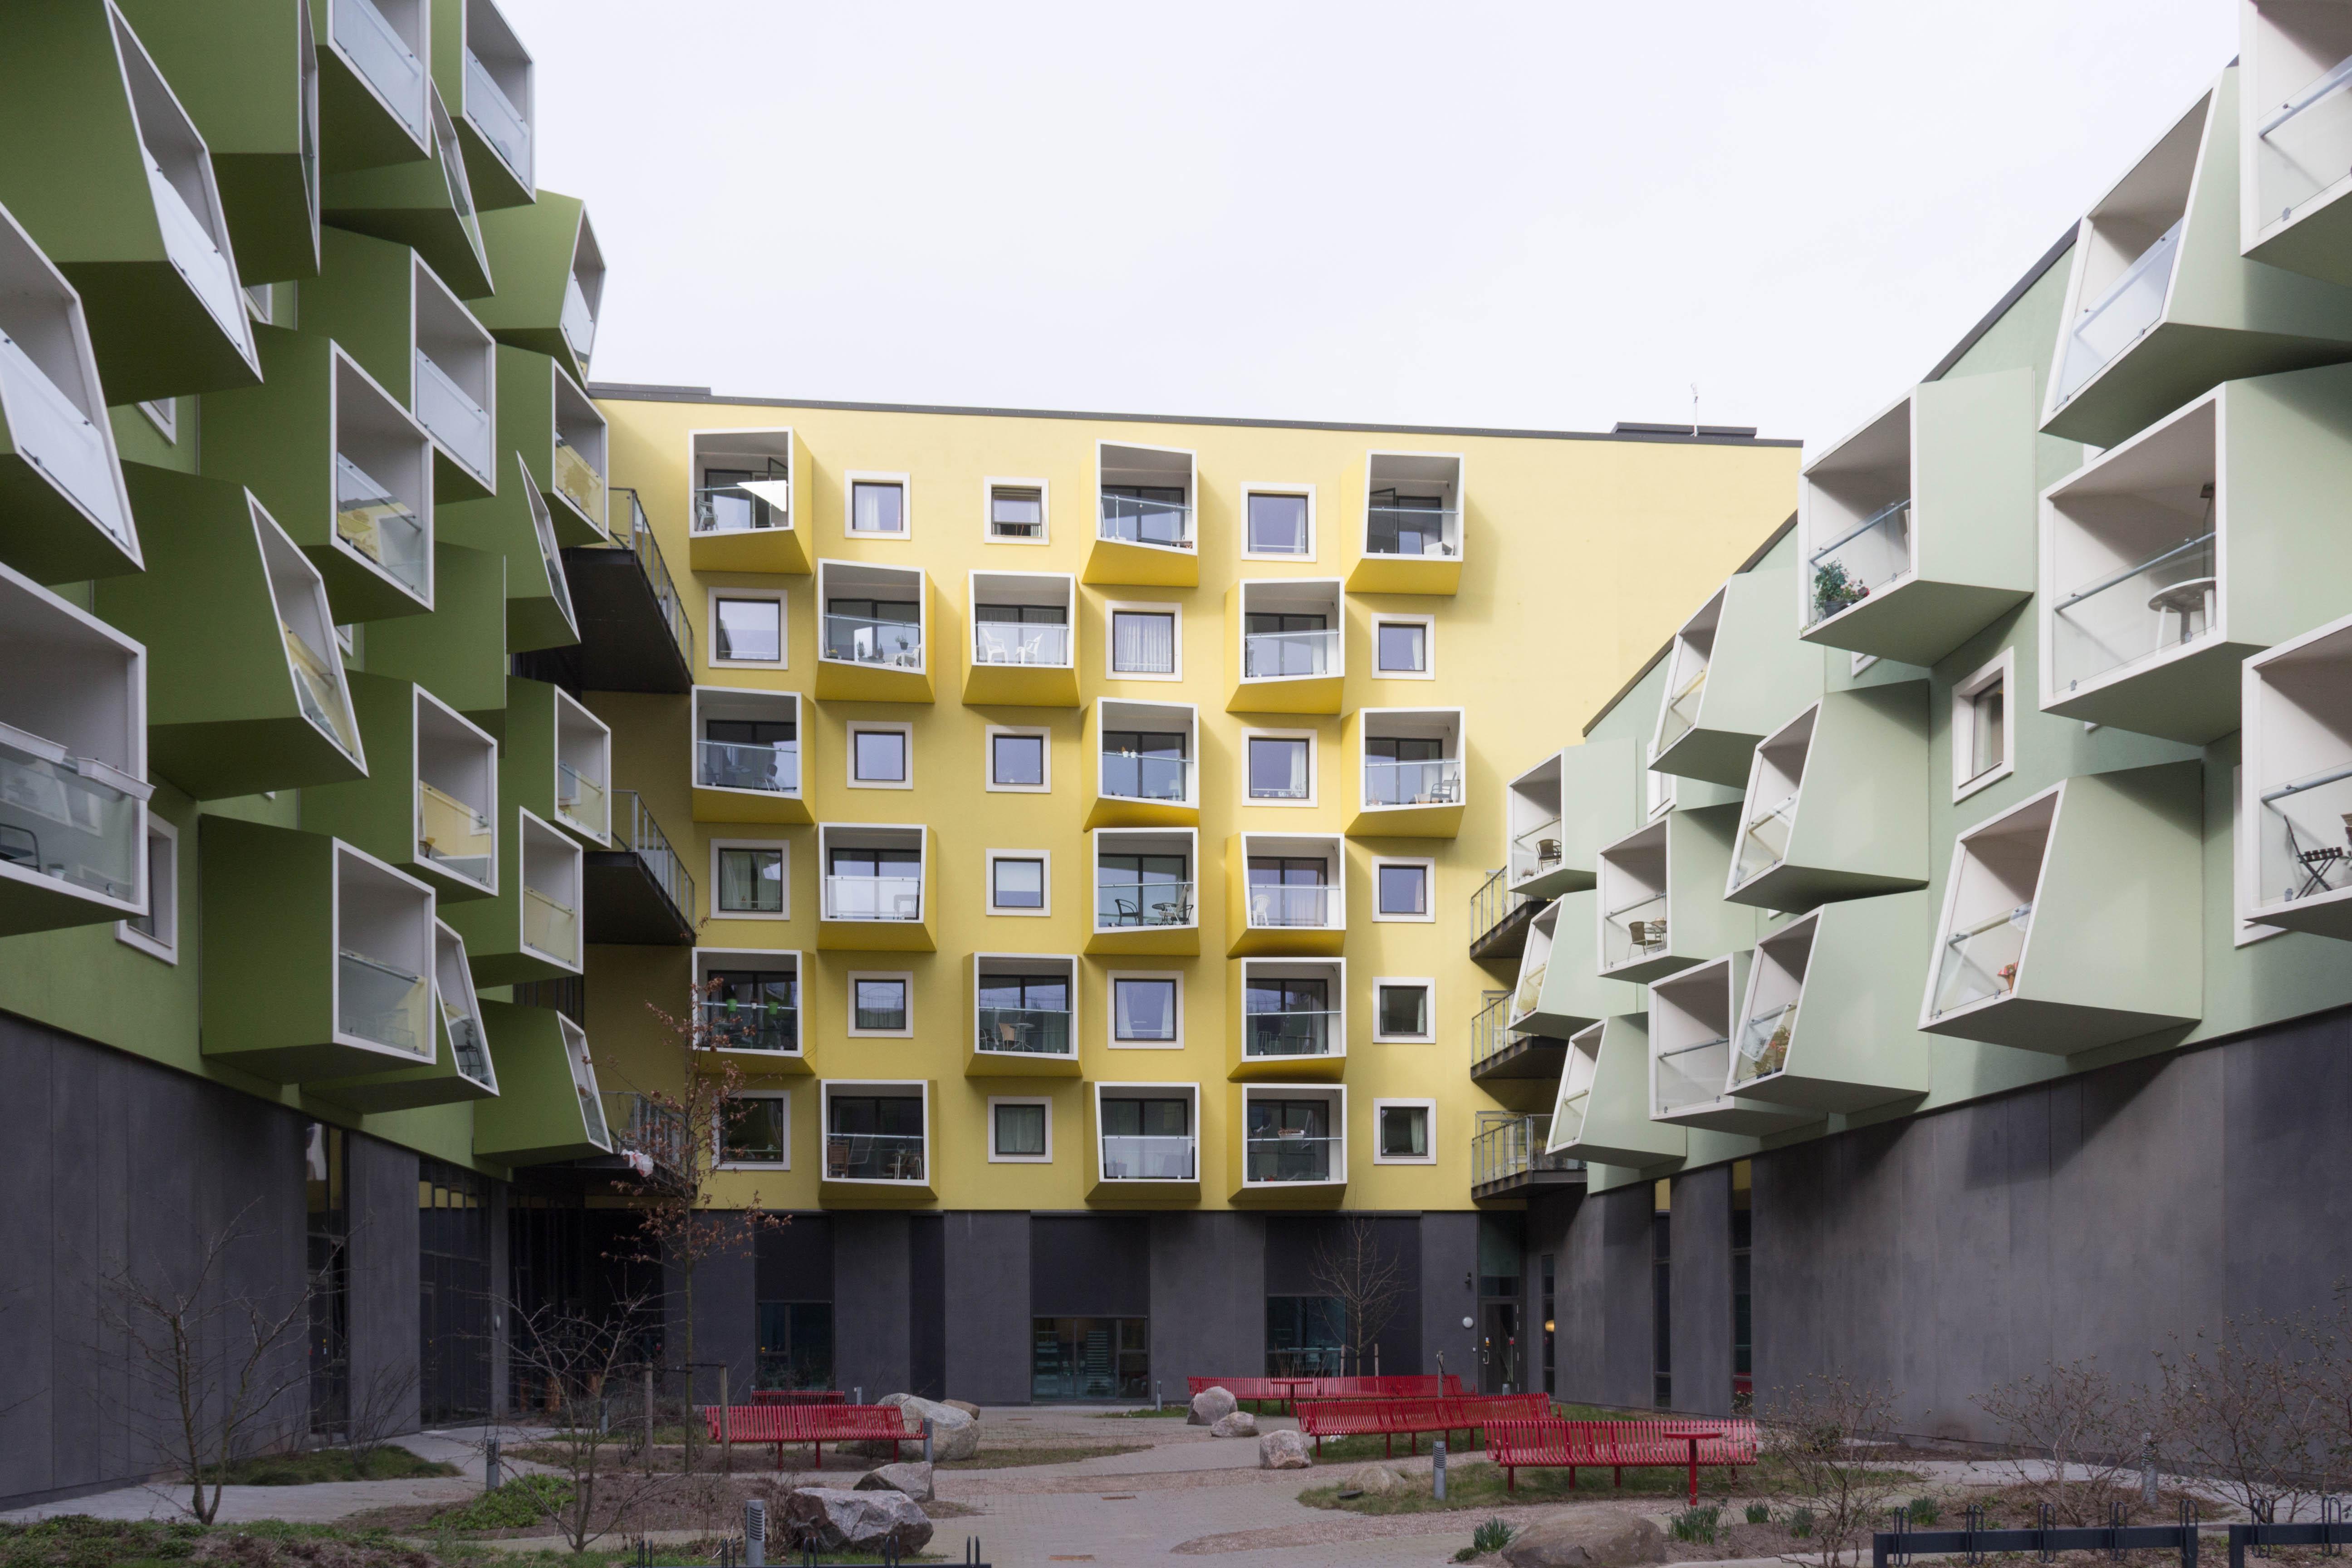 Fond d 39 cran architecture b timent mur maison balcon for Balcon facade maison